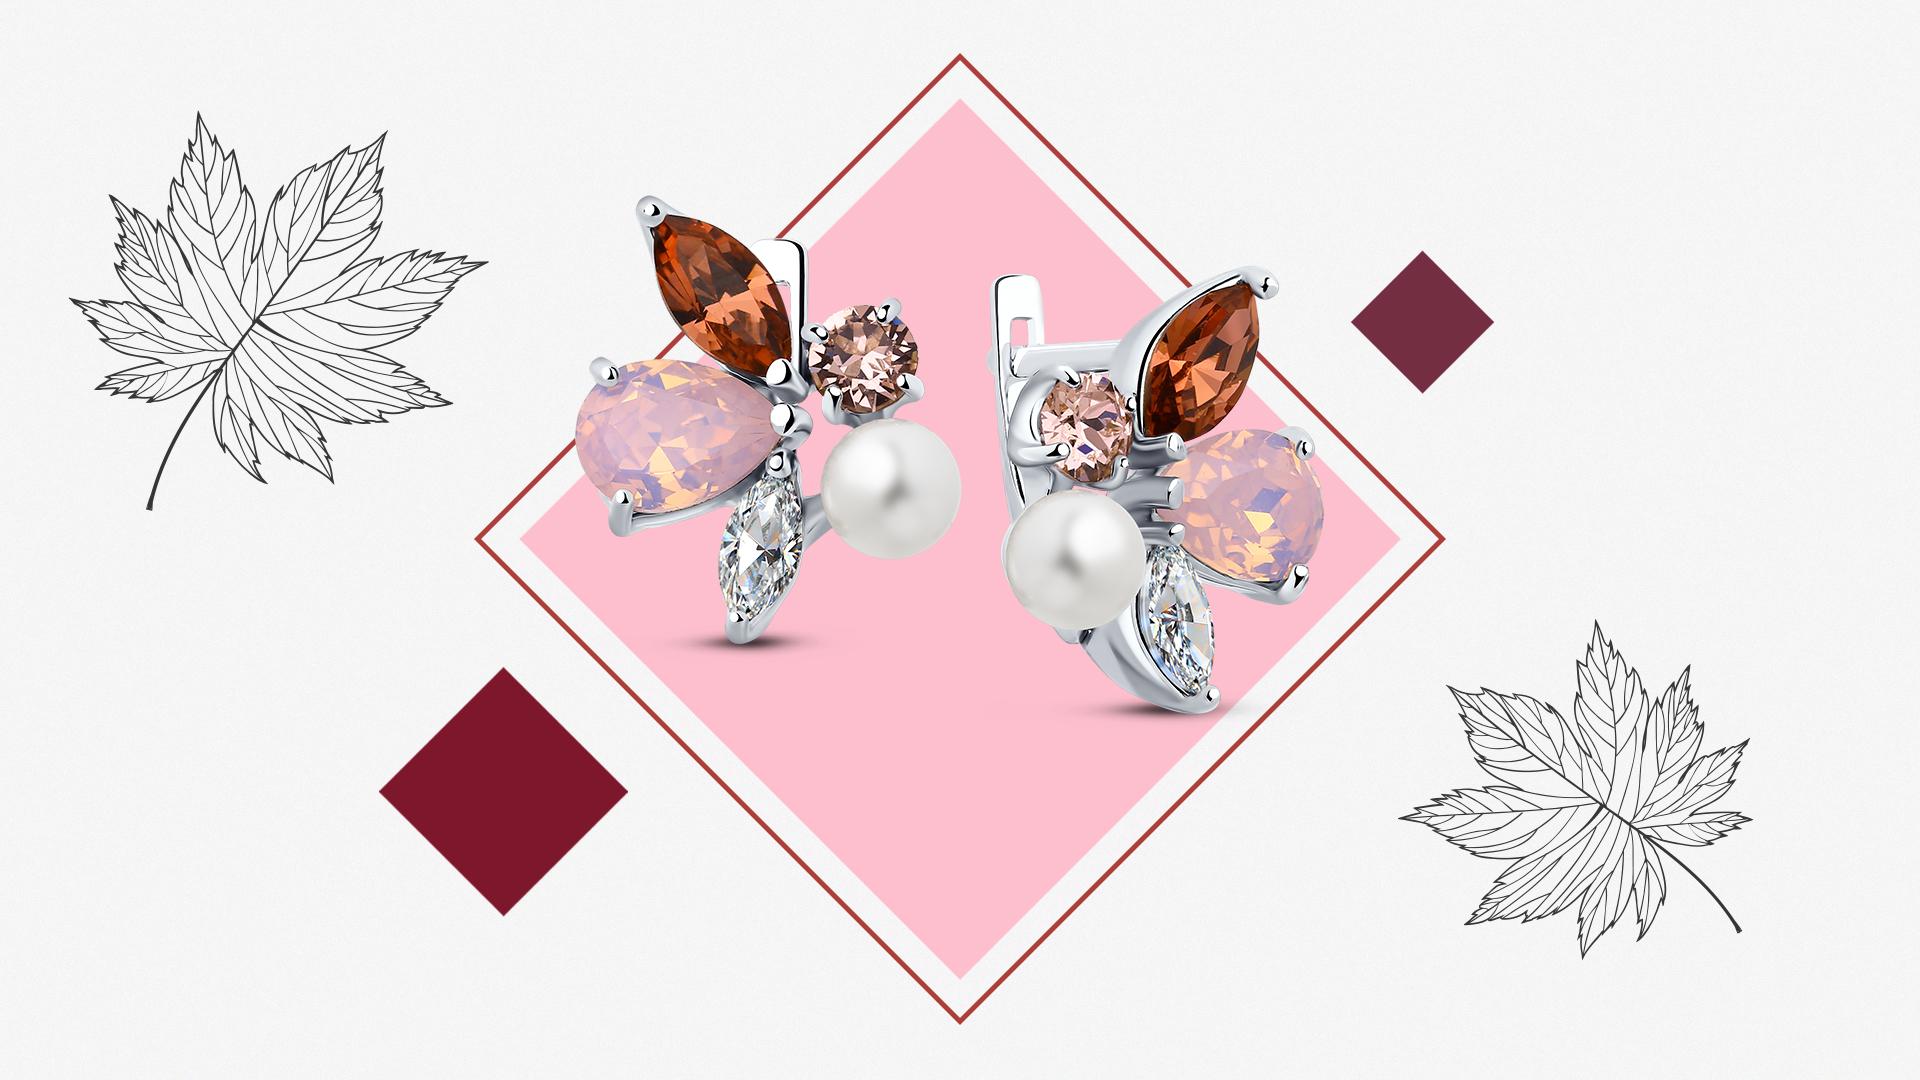 Серьги из серебра с жемчугом Swarovski и кристаллами Swarovski